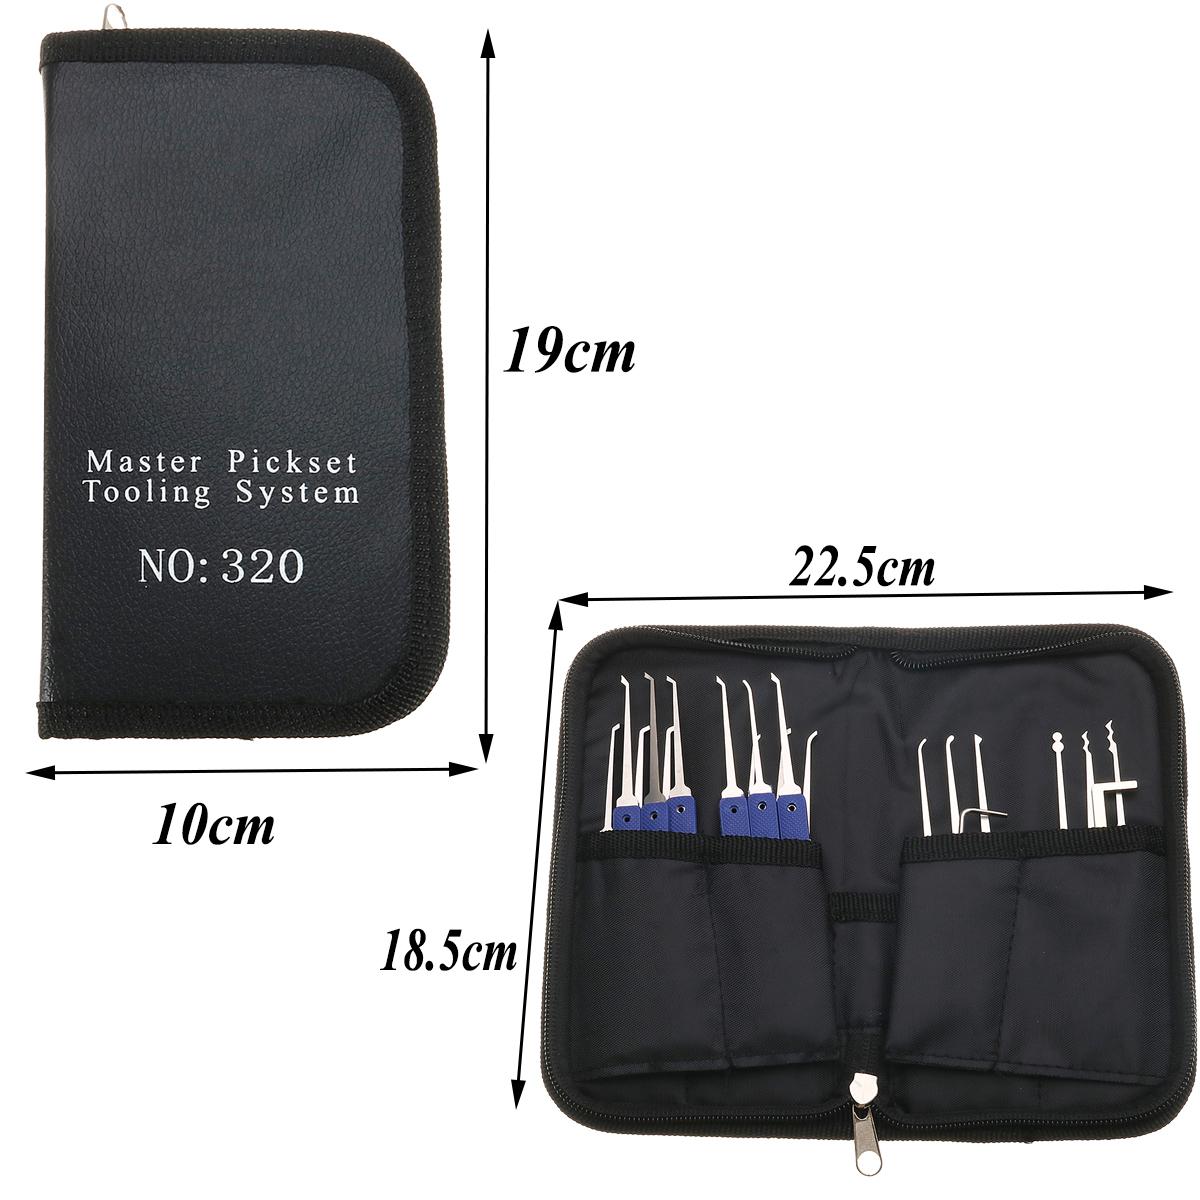 18 in 1 Stainless Steel Lock Pick Set Kit Locksmith Tools Quick Door Openner